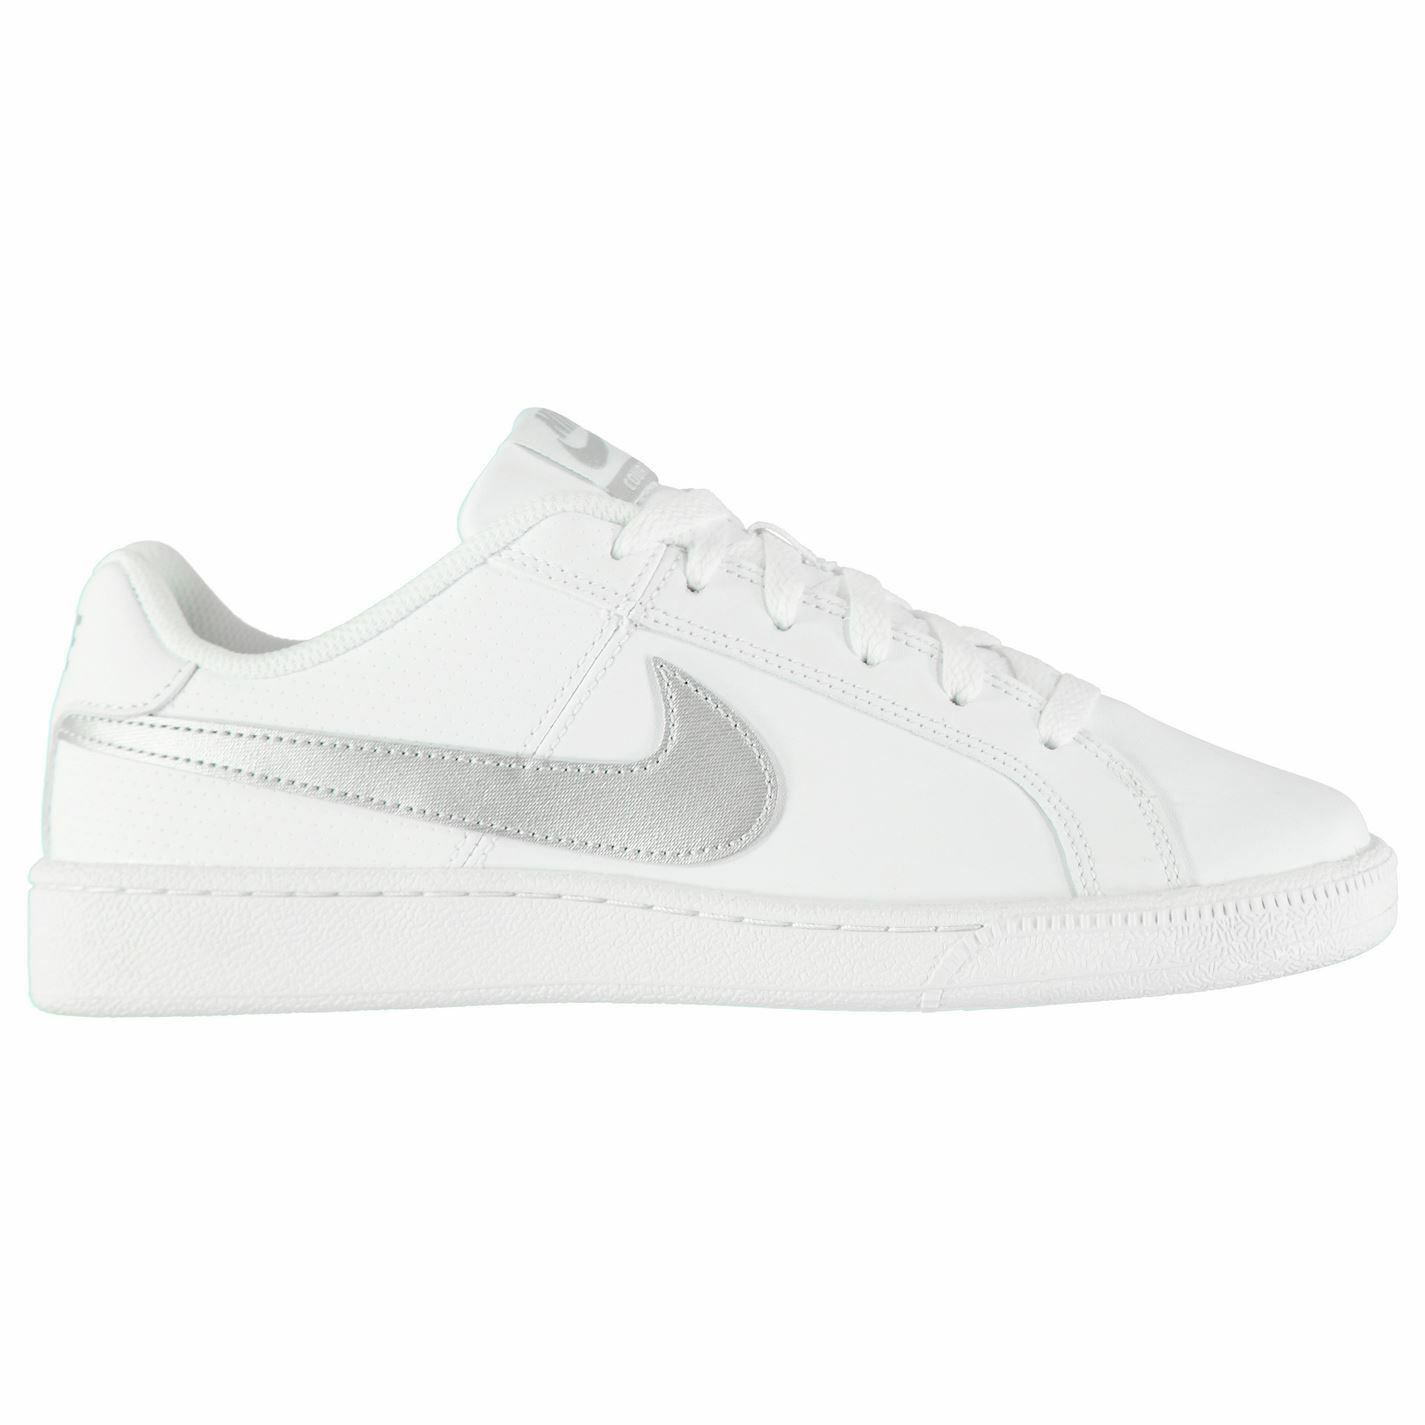 Nike Hof Royale Turnschuhe Damen Weiß Silber Silber Silber Sport Turnschuhe Sportschuhe   2321b5